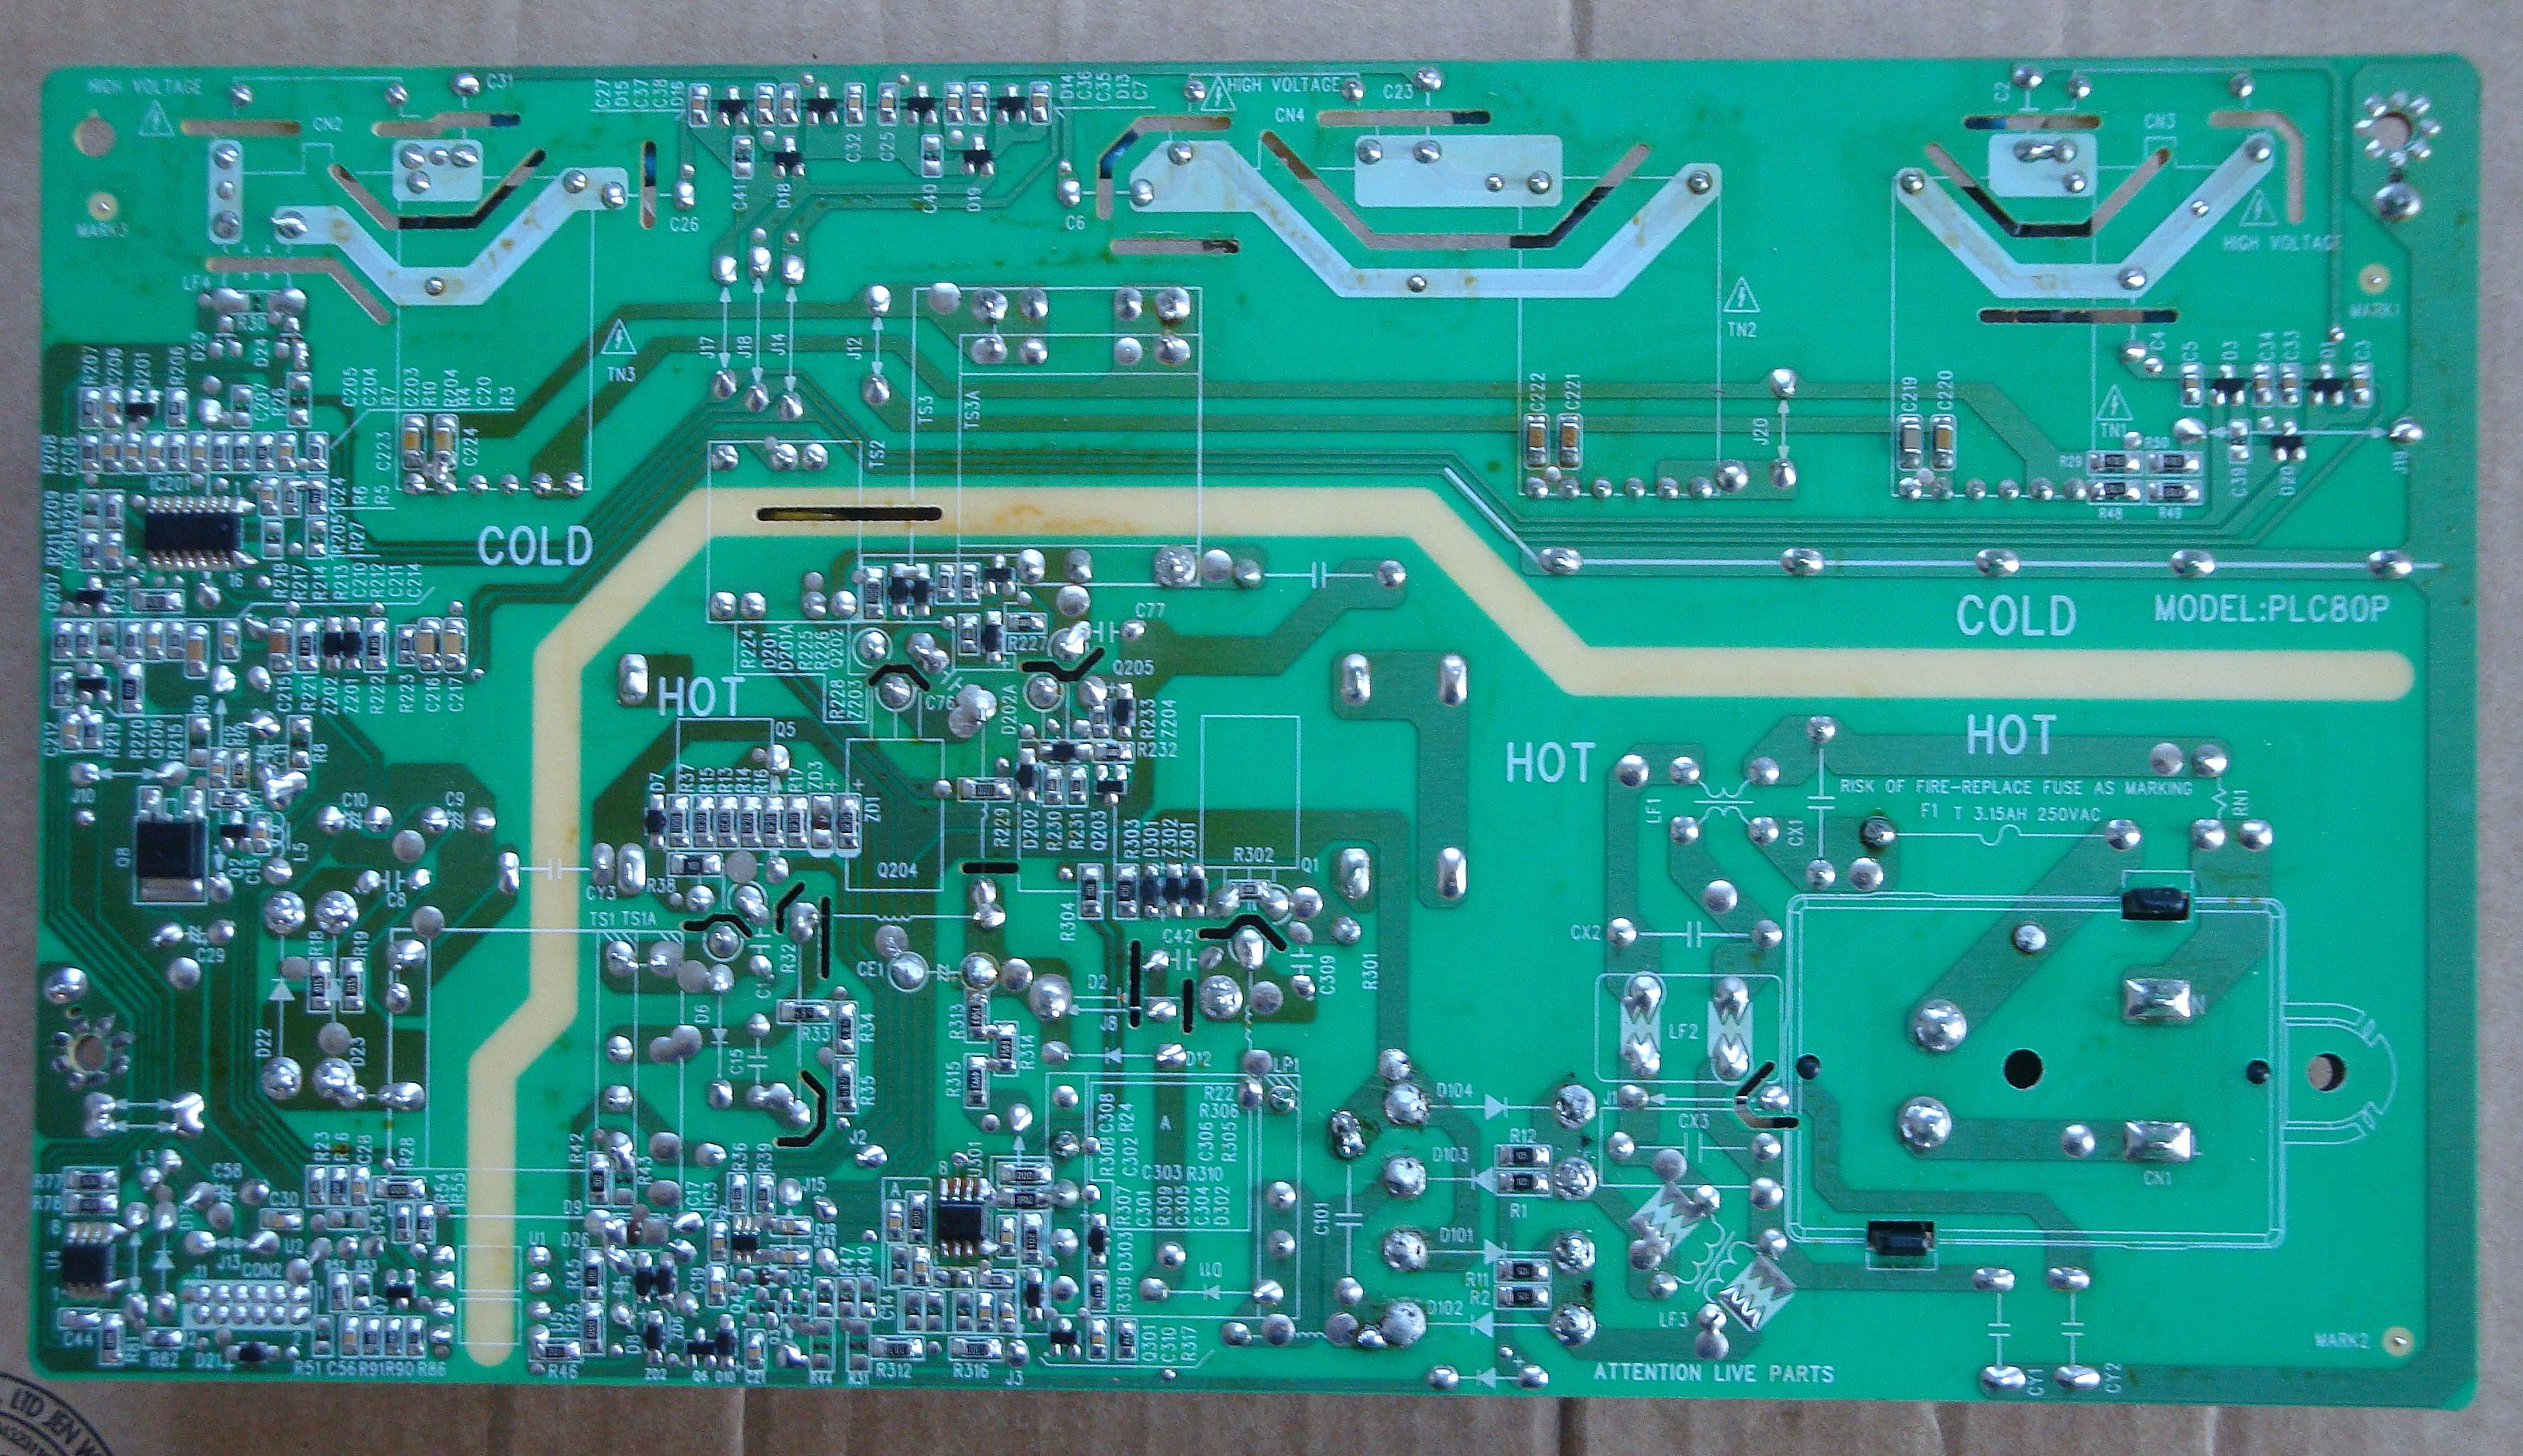 PLC80C_002.JPG